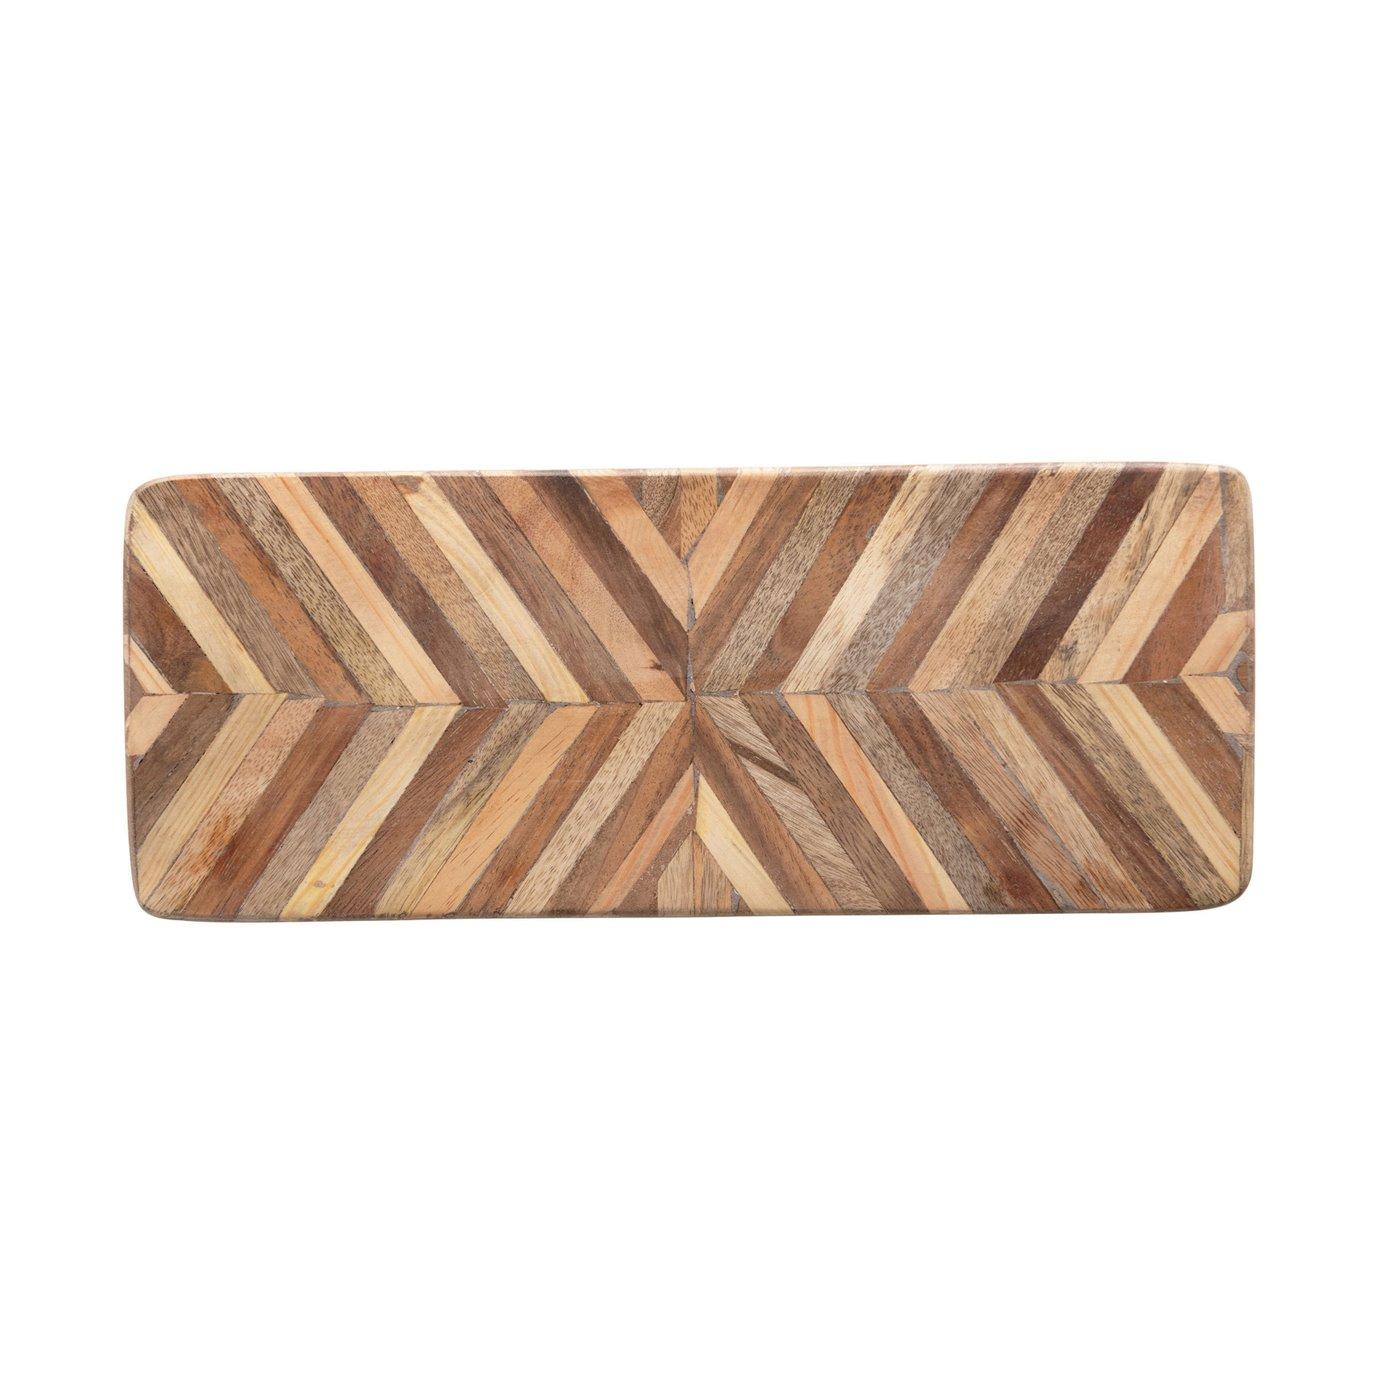 Mango Wood Cheese/Cutting Board with Chevron Pattern